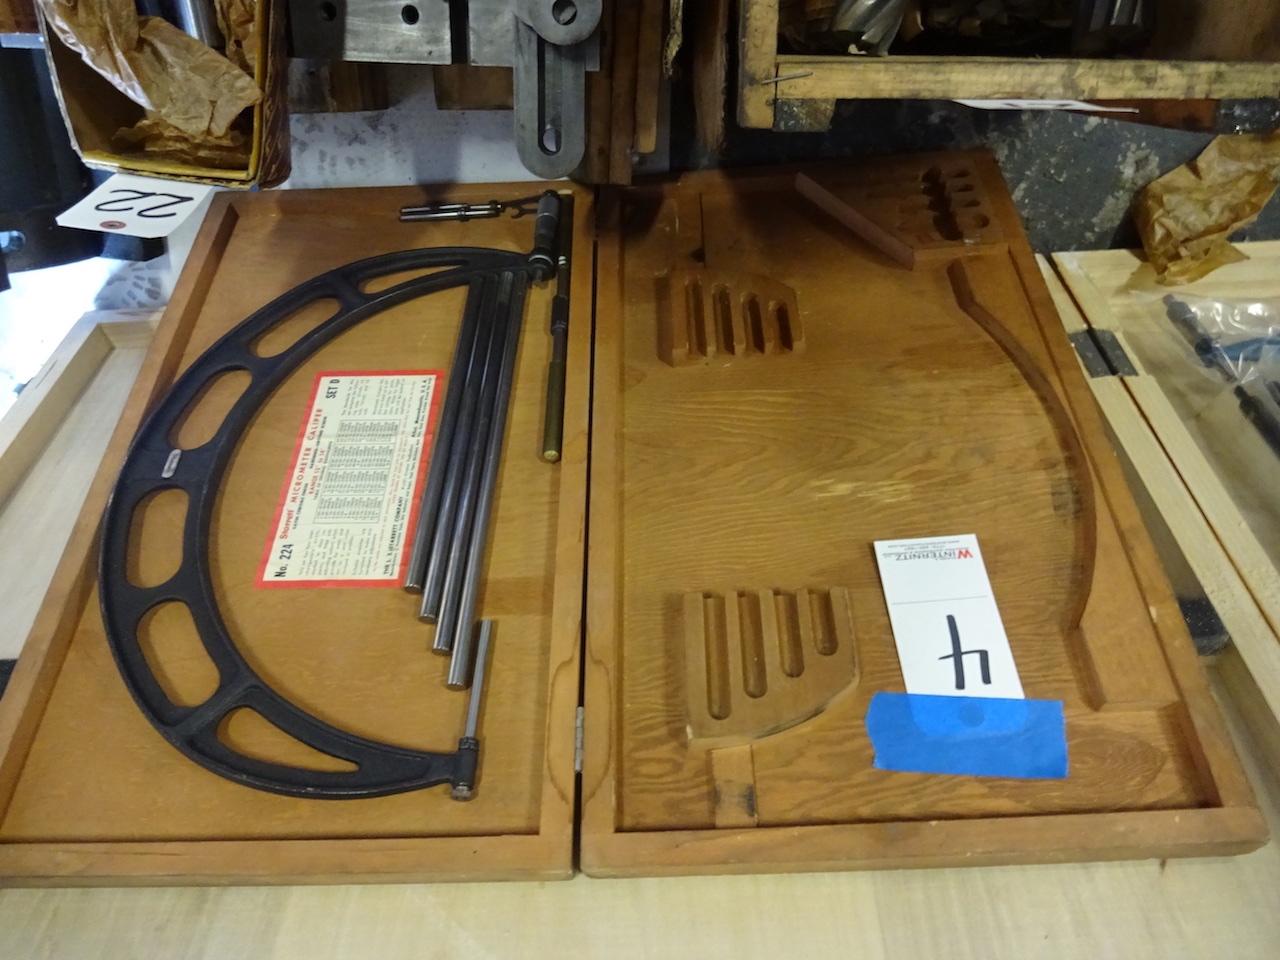 Lot 4 - Starrett No. 224 12 in. - 16 in. Micrometer